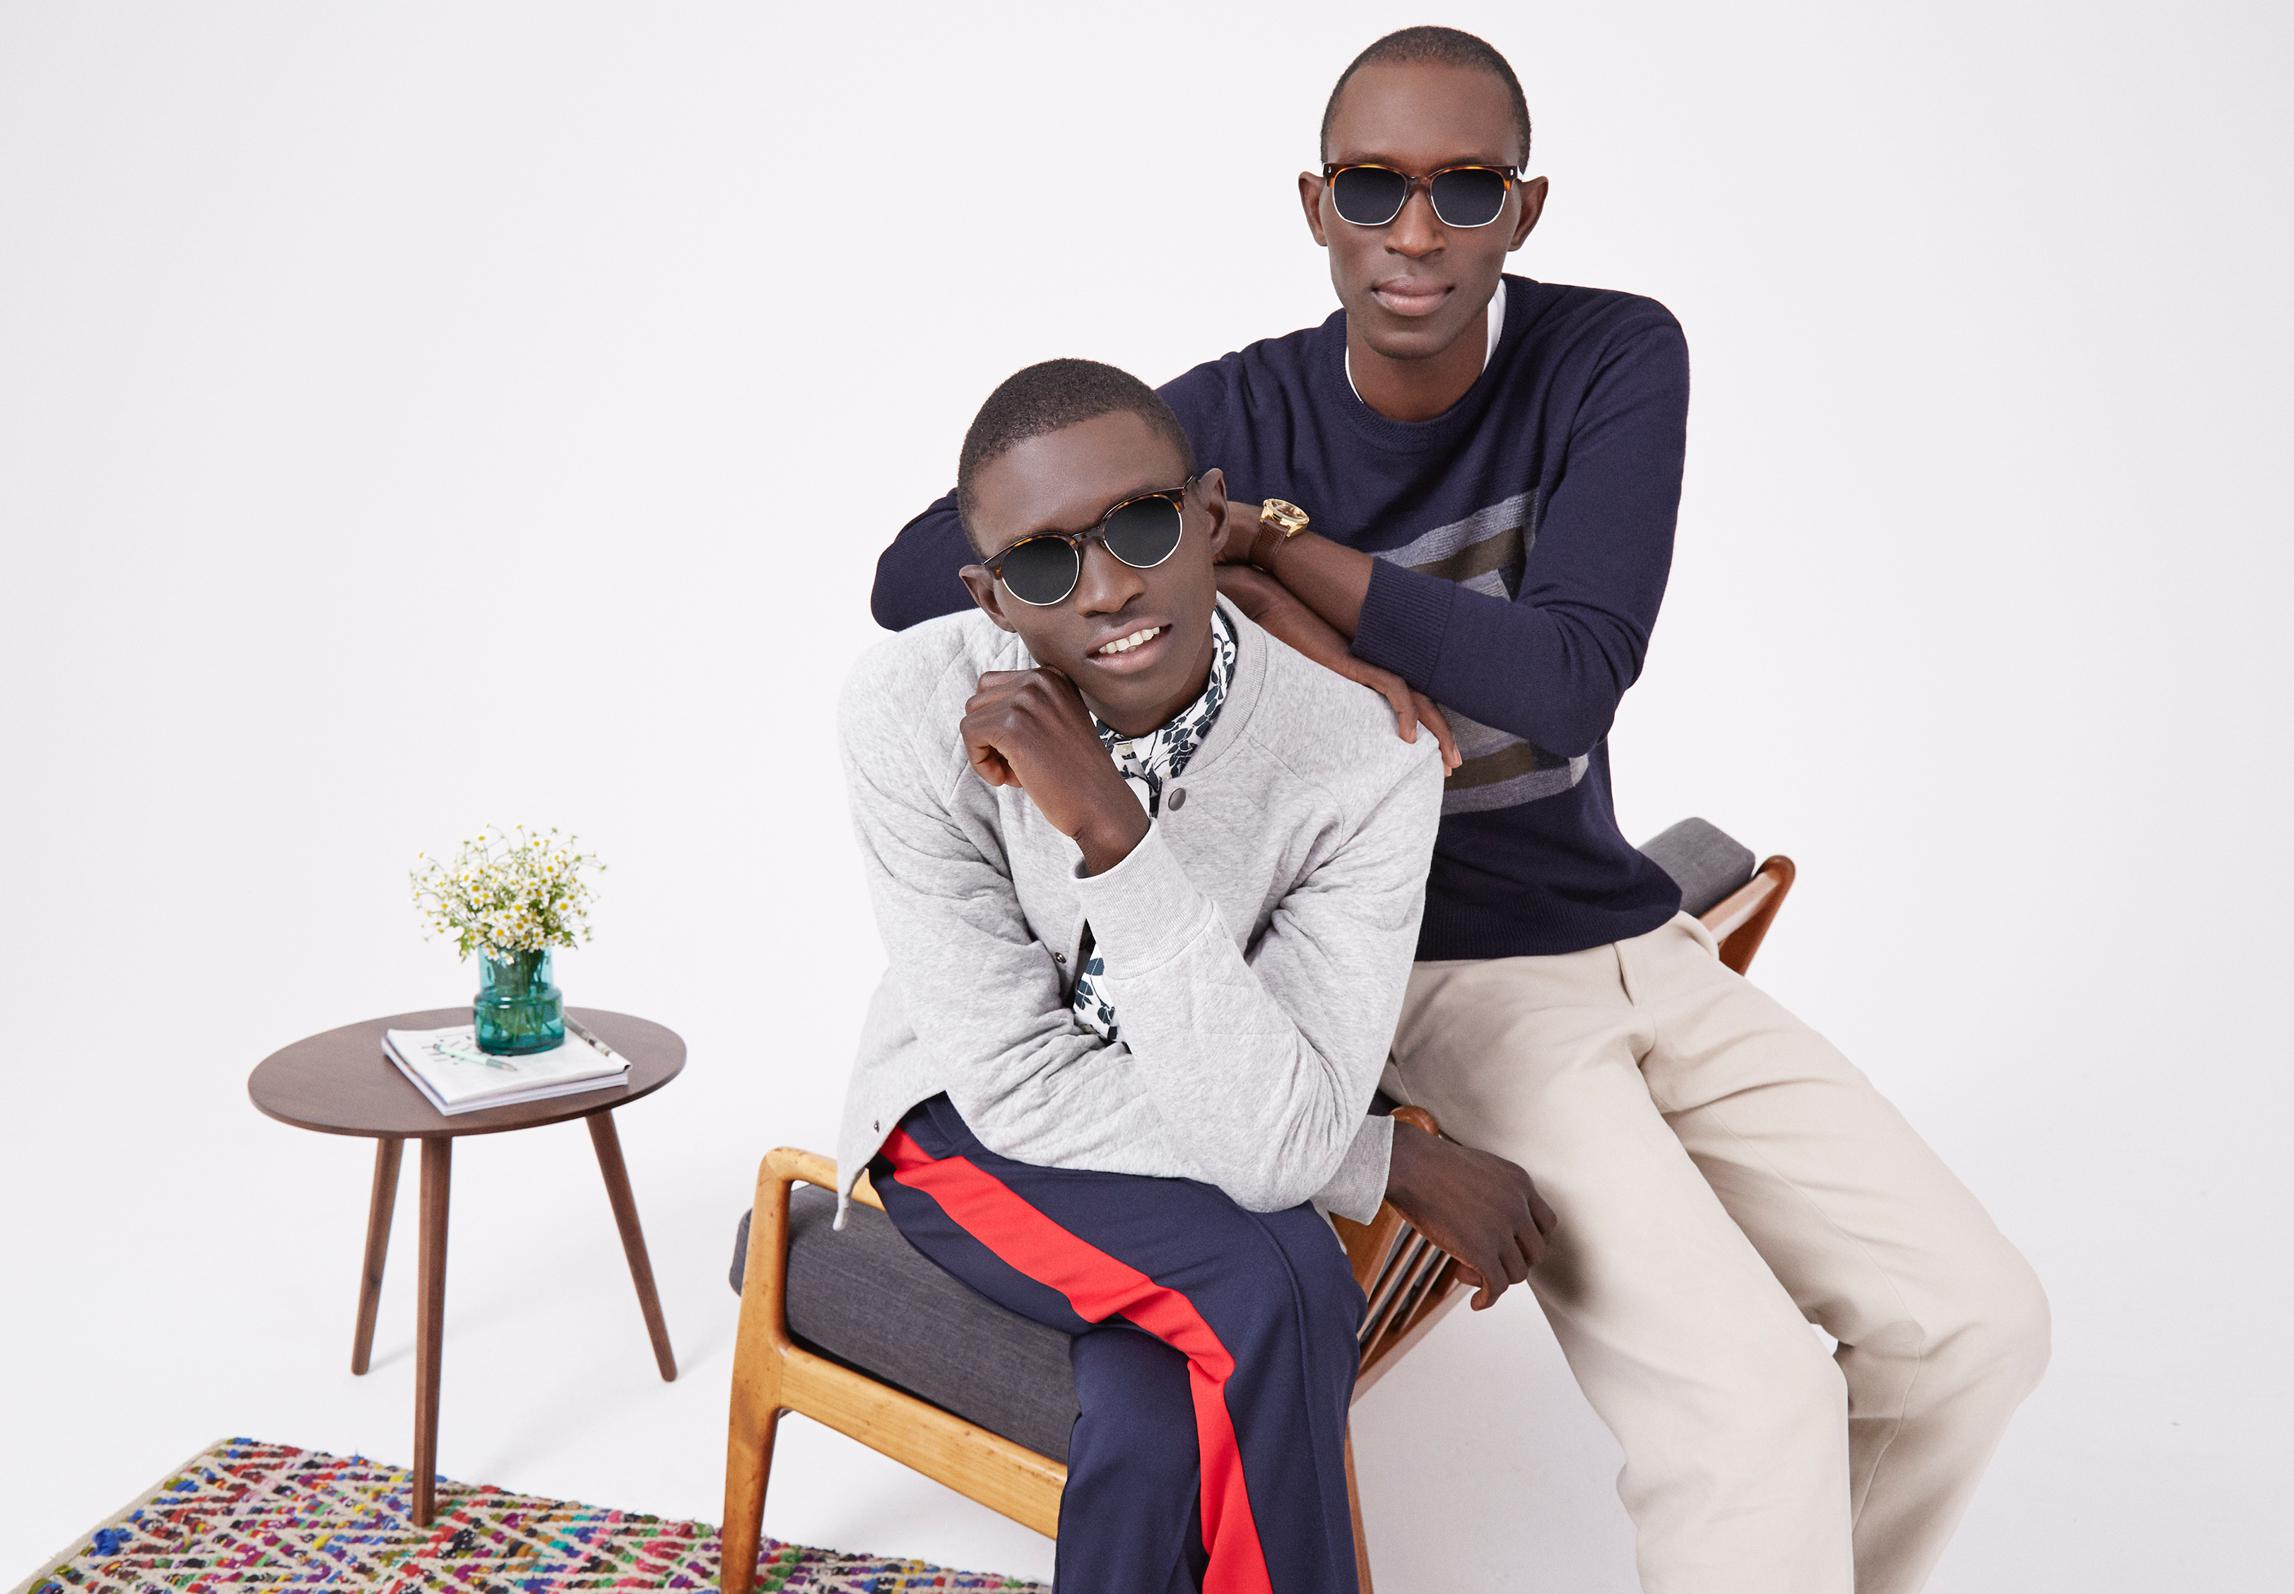 Armando leans on Fernando, both wearing sunglasses